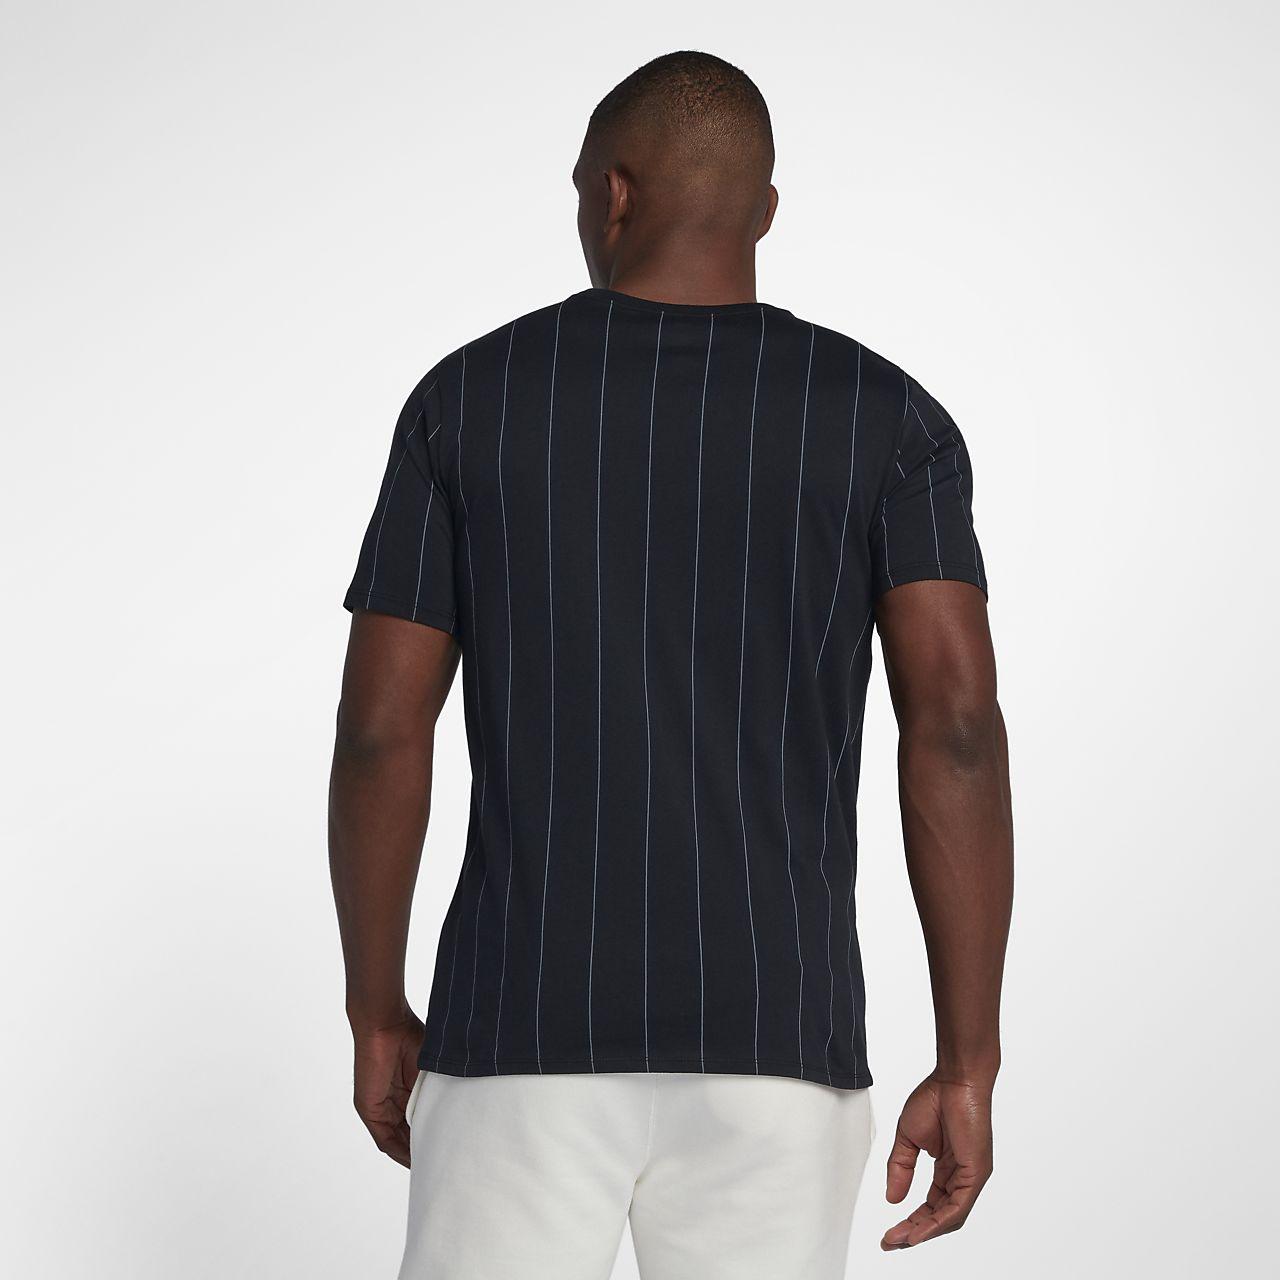 Jordan Sportswear AJ 9 Men's T-Shirt. Nike.com